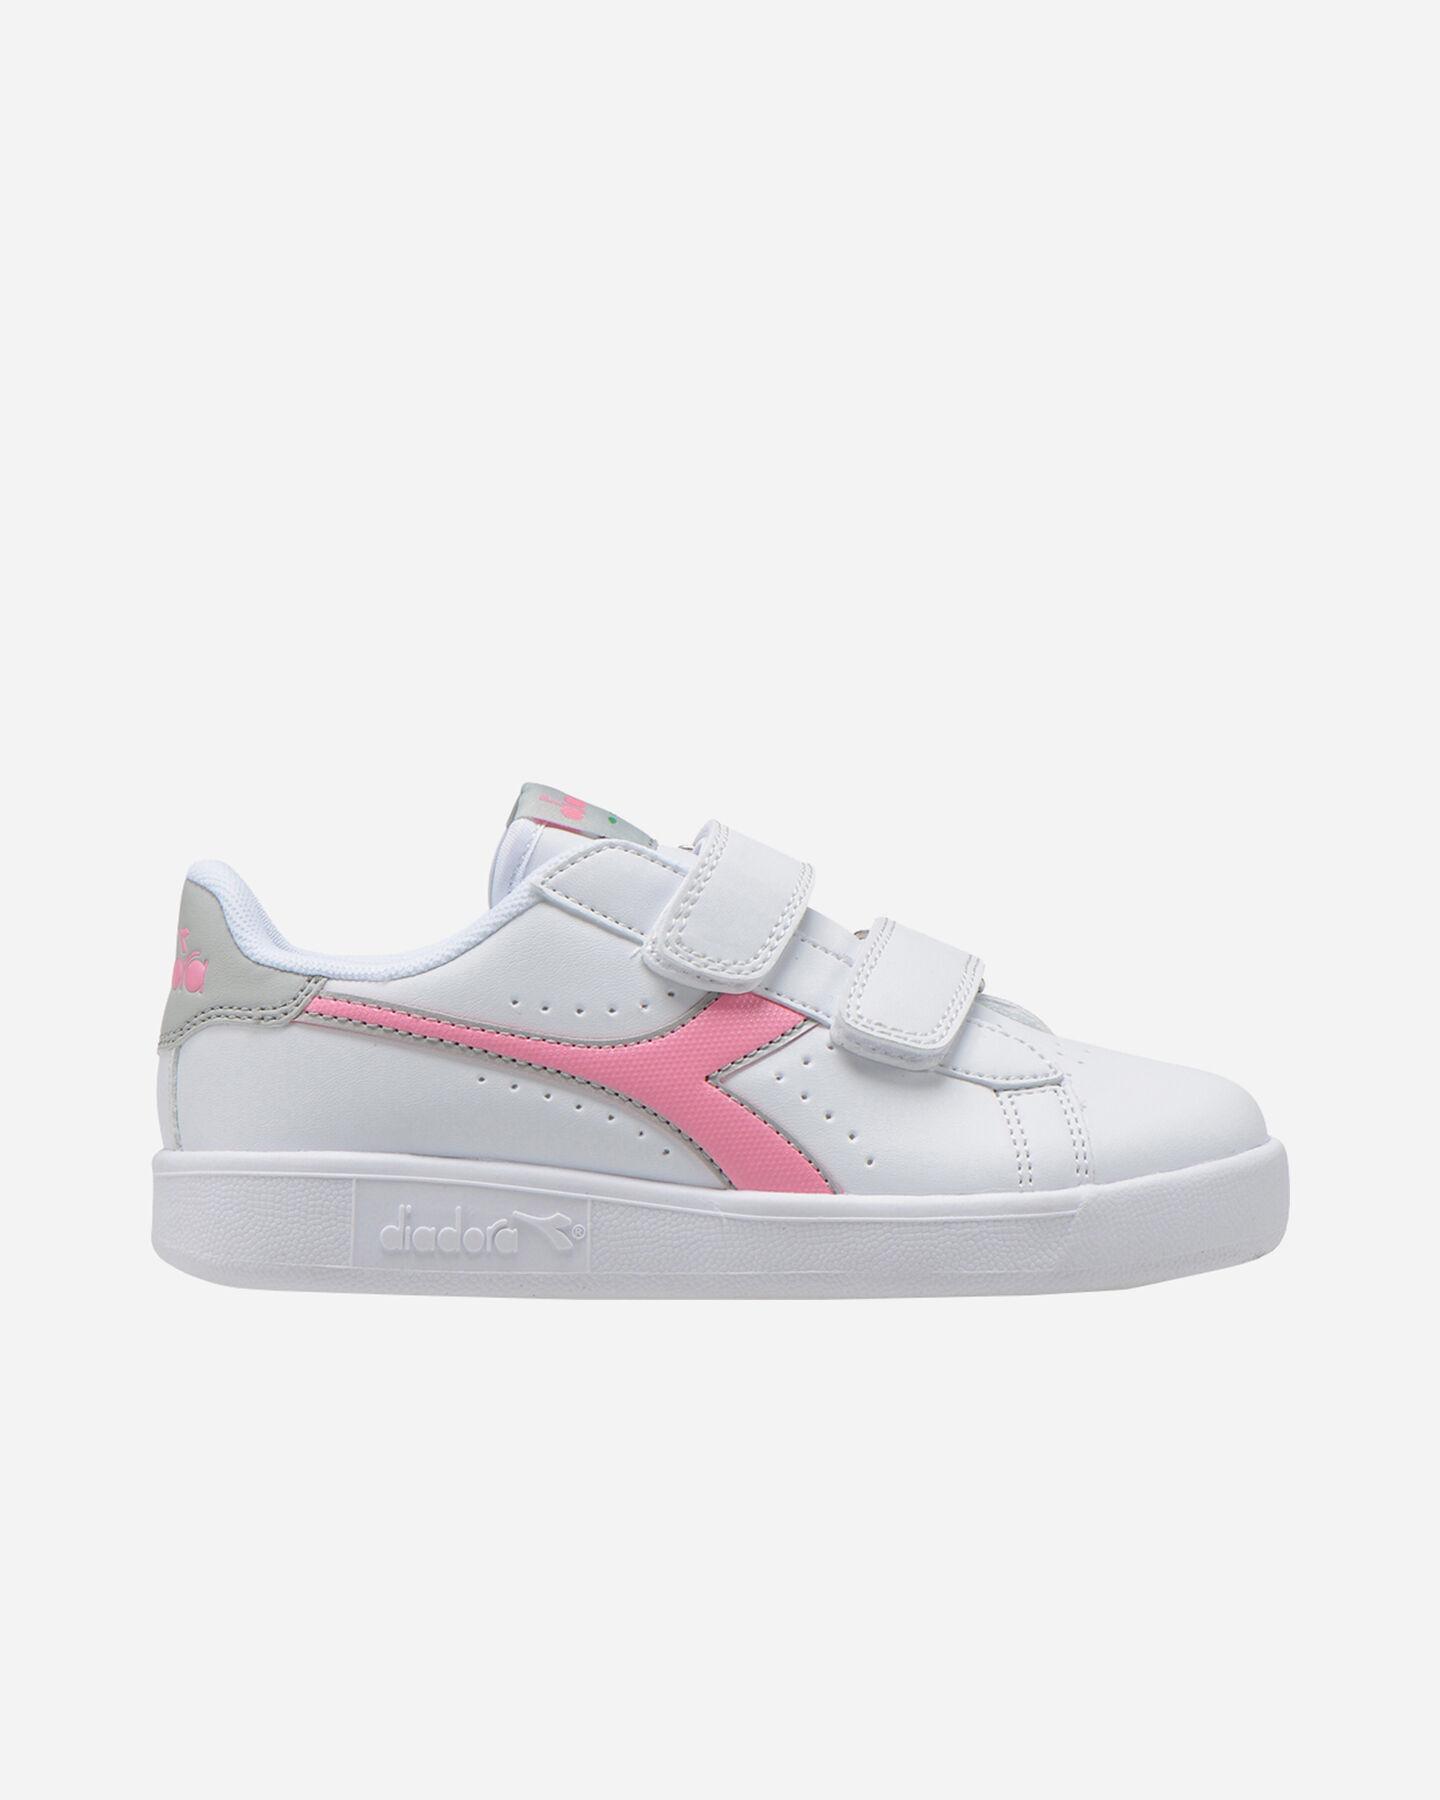 Sport Ciabatte Sandali Scarpe Cisalfa Scarponi Sneakers Bambino wYqBExOT 043933a9b86